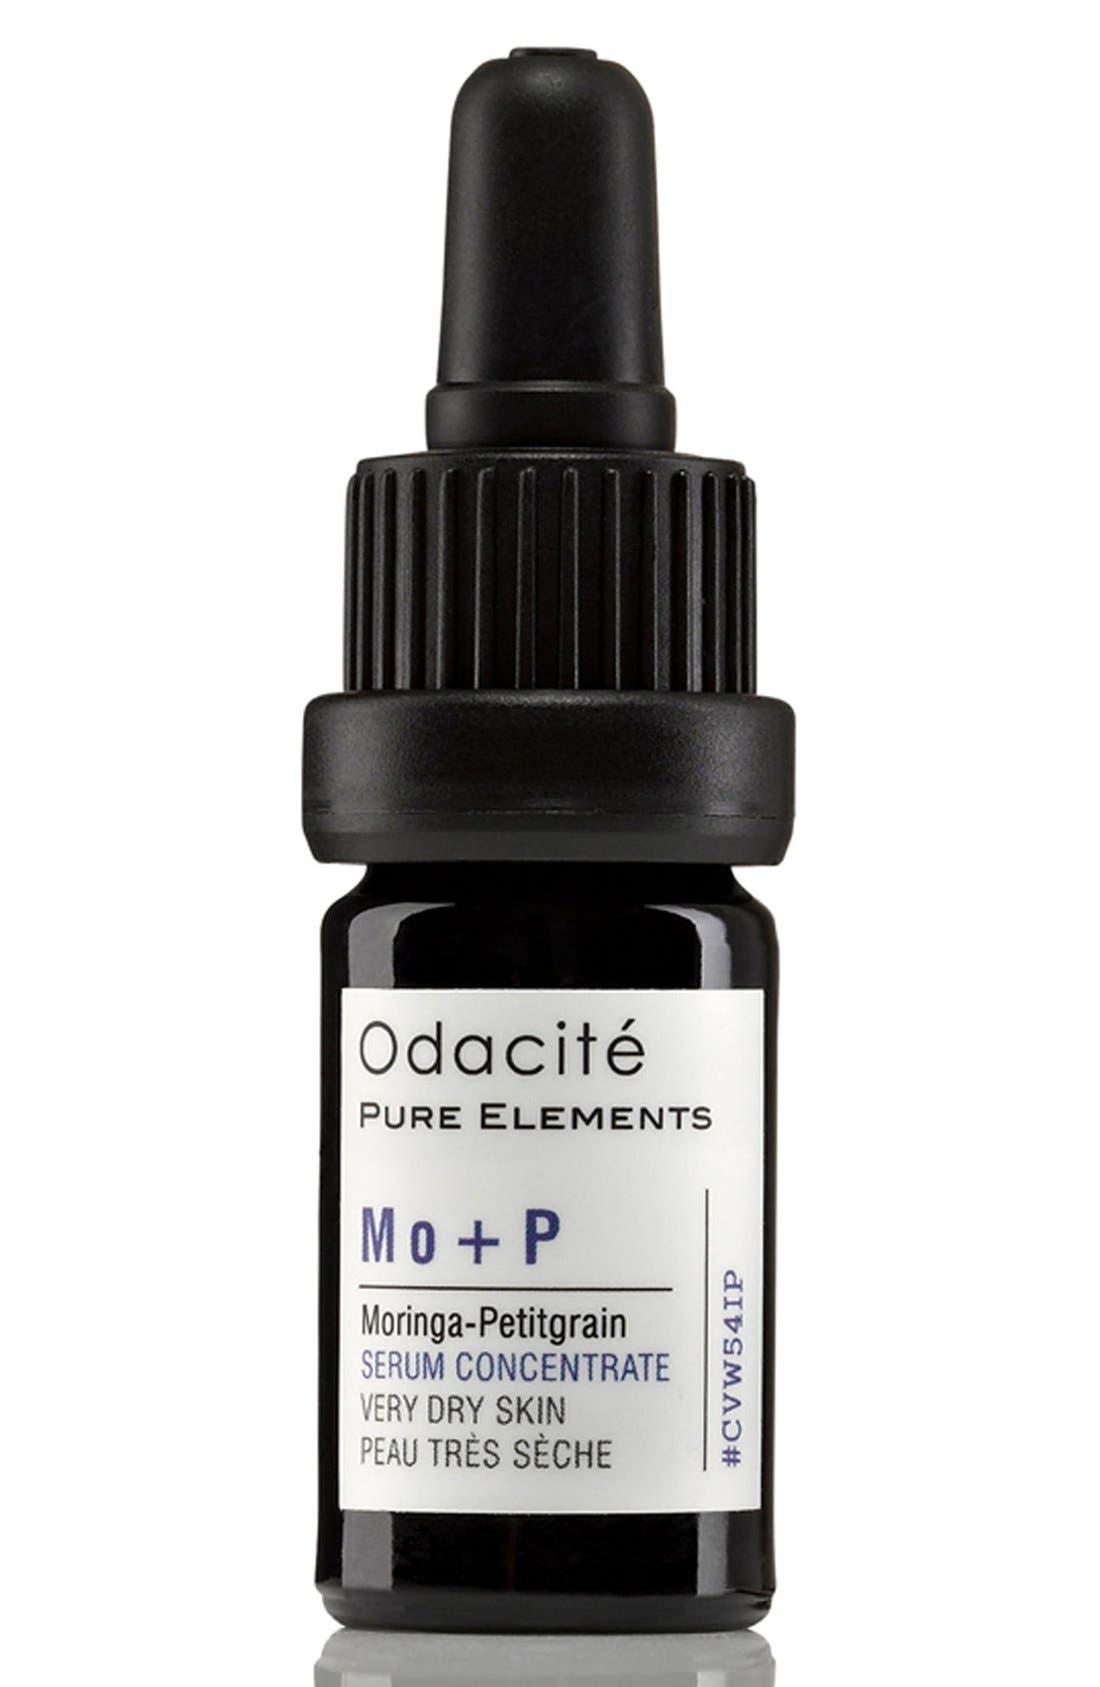 Mo + P Moringa-Petitgrain Very Dry Skin Serum Concentrate,                             Main thumbnail 1, color,                             NO COLOR